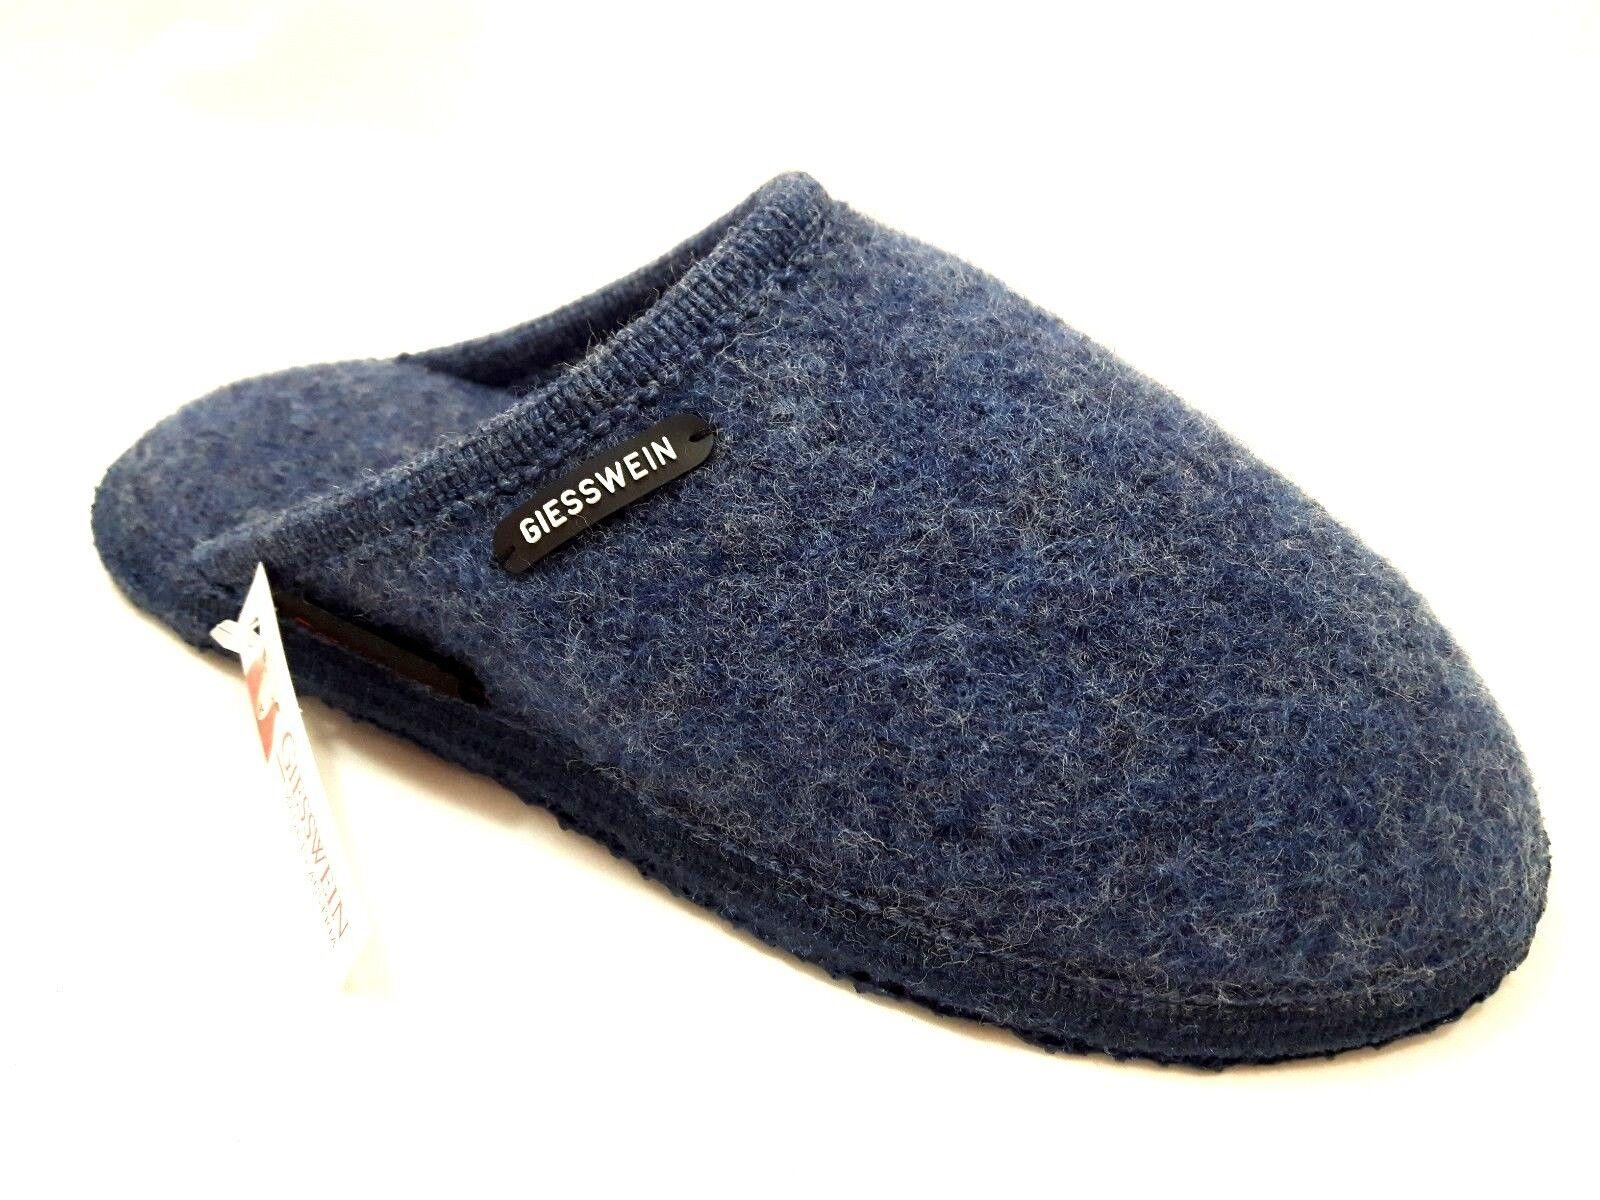 Ciabatte Pantofole GIESSWEIN TINO jeans blu donna uomo unisex lana